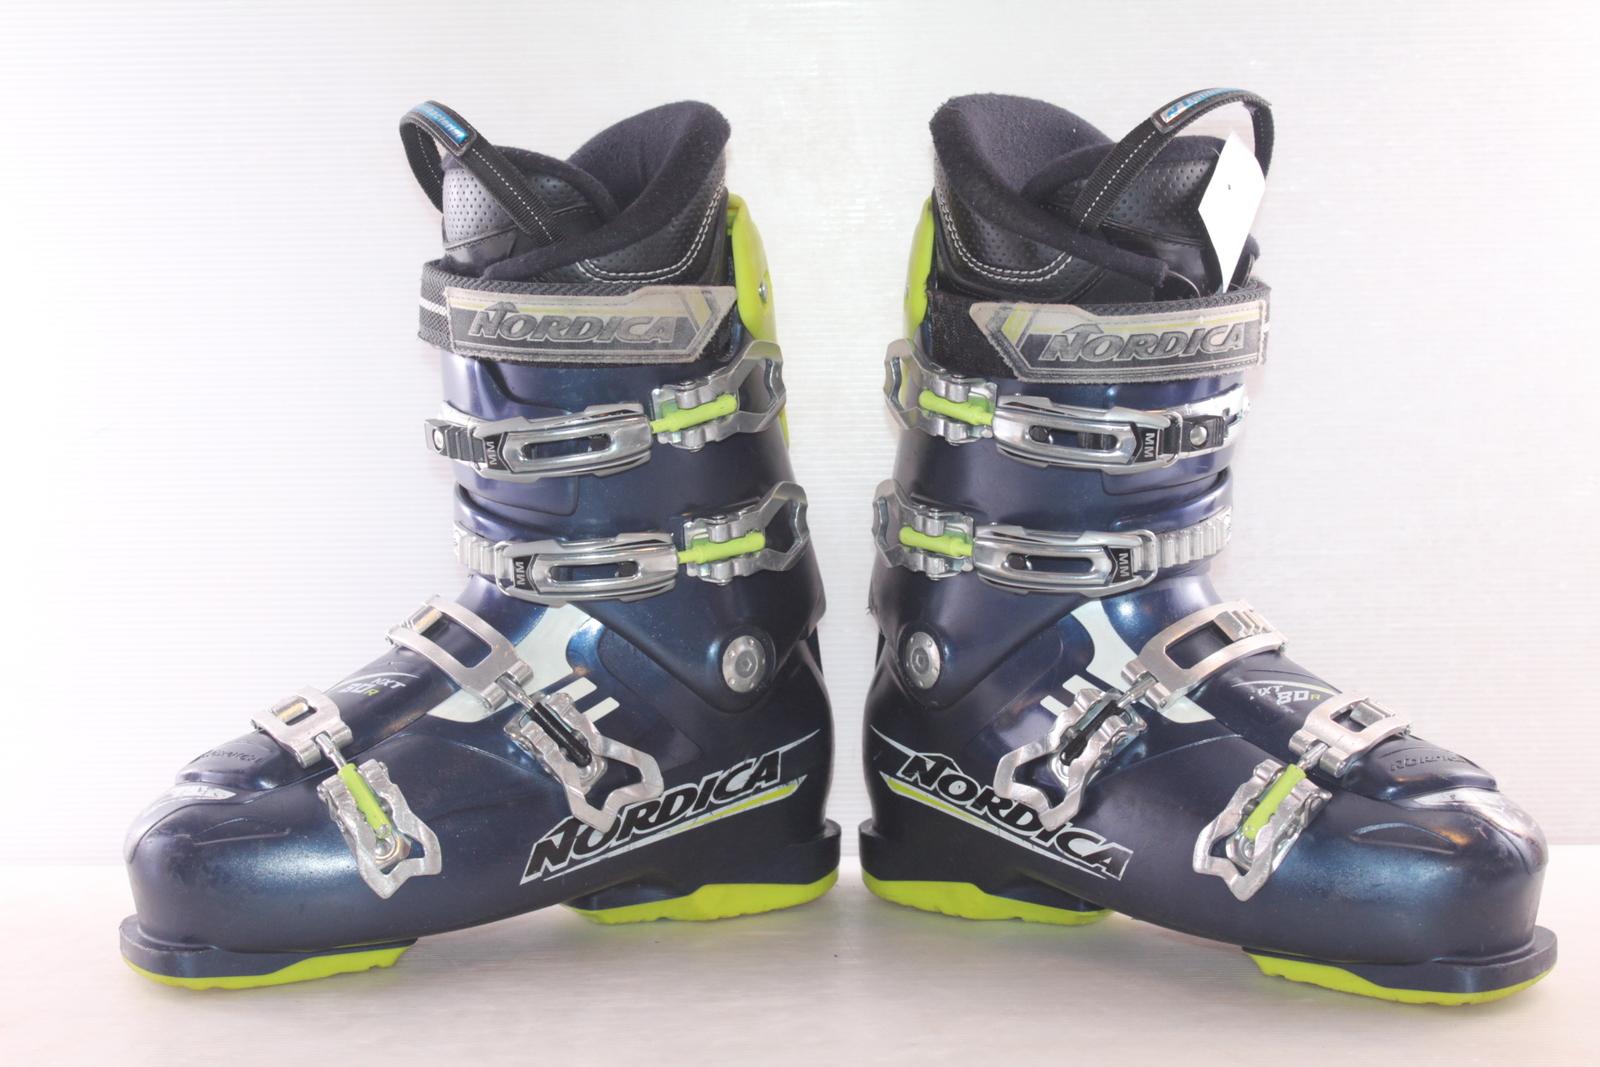 Lyžařské boty Nordica NXT 80 R vel. EU42.5 flexe 80